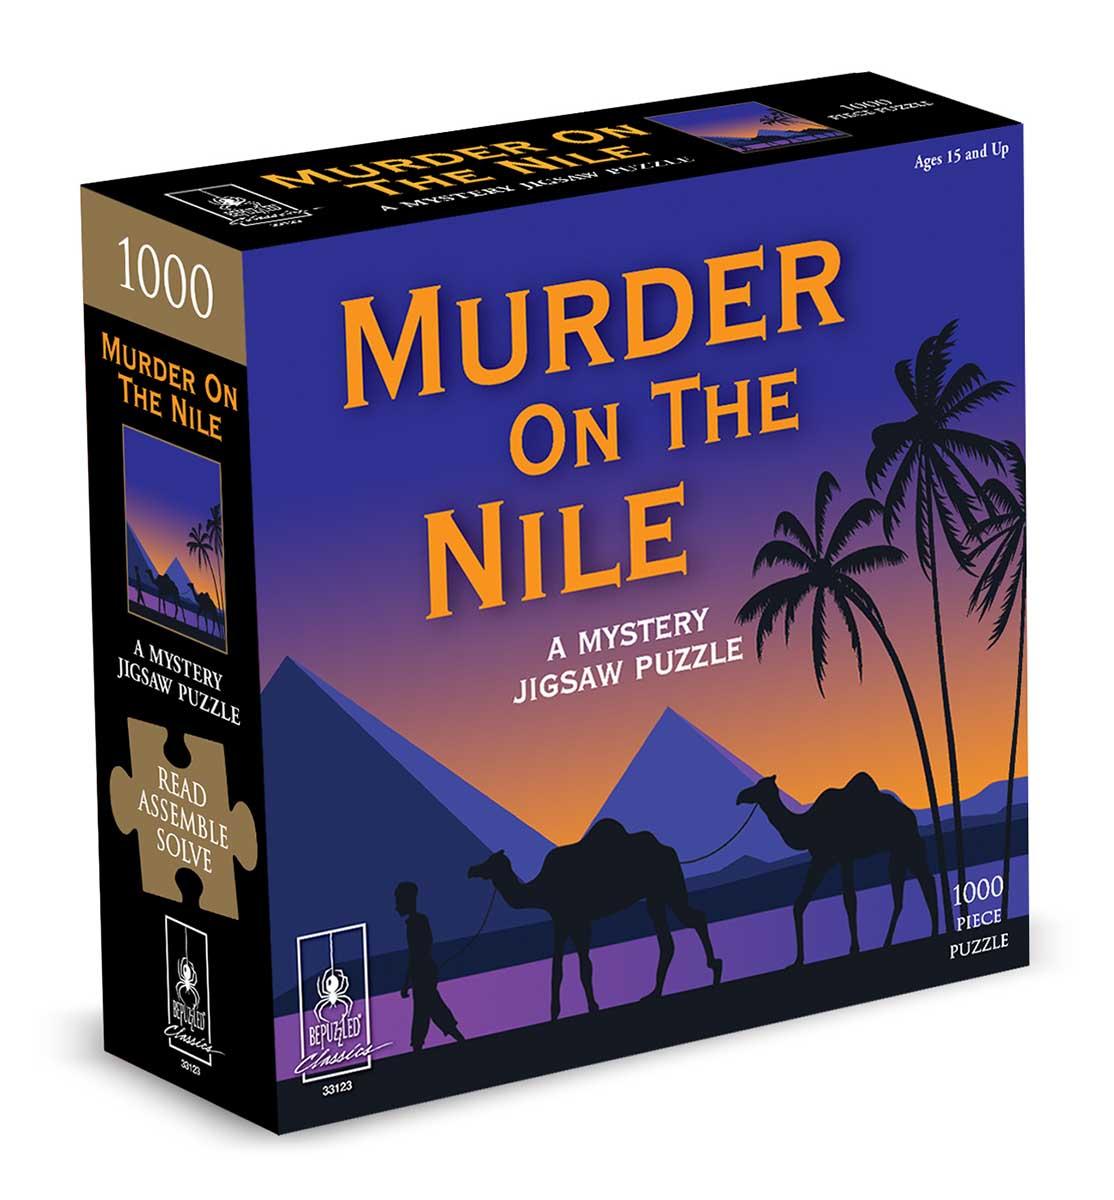 Murder On the Nile Murder Mystery Jigsaw Puzzle